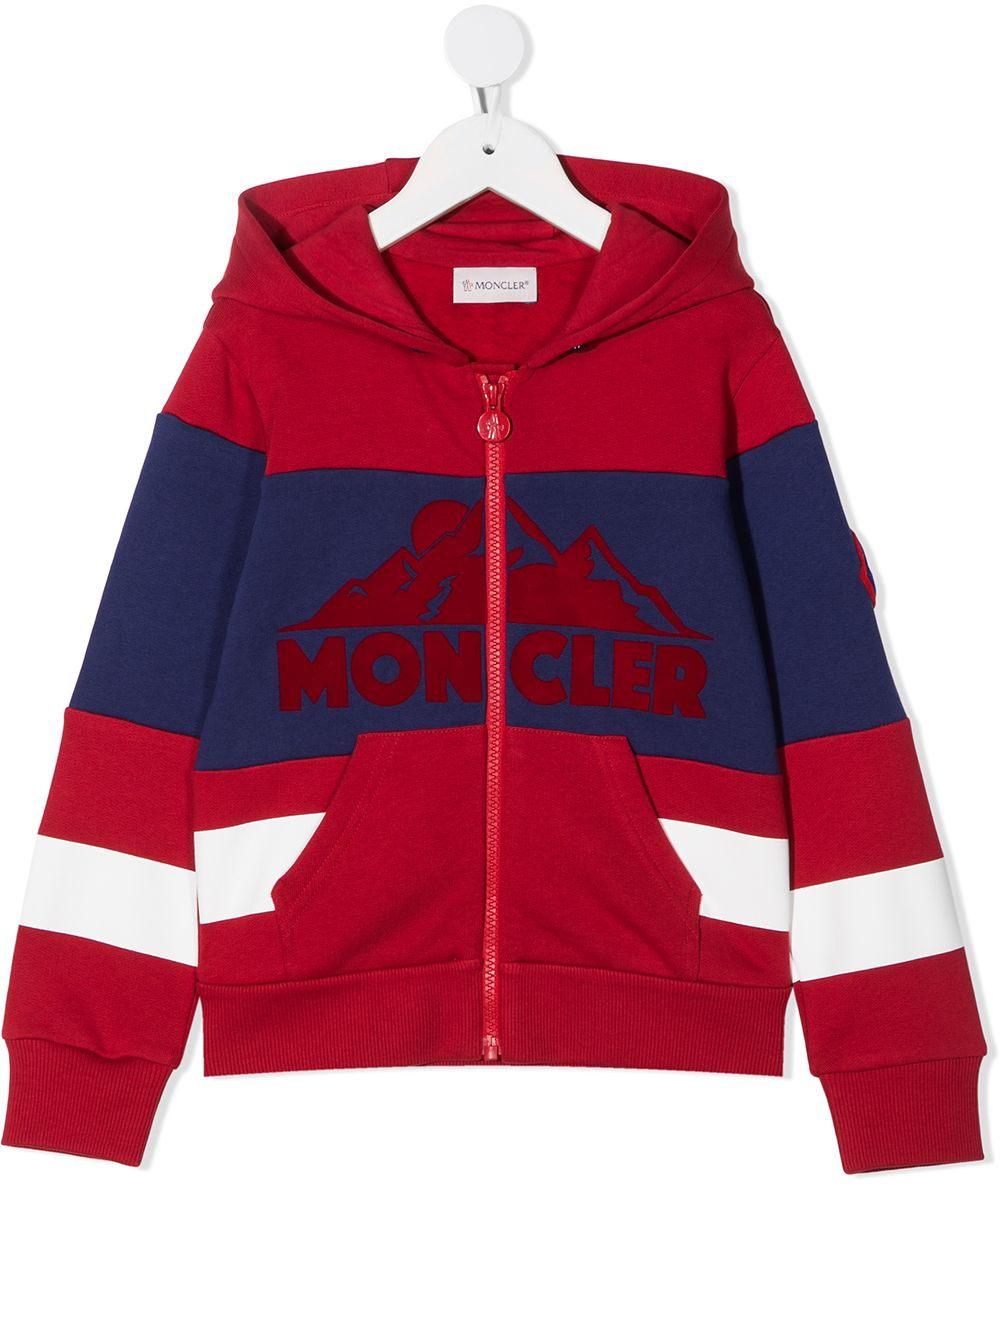 MONCLER   Sweatshirt   F29548G74120809B3456